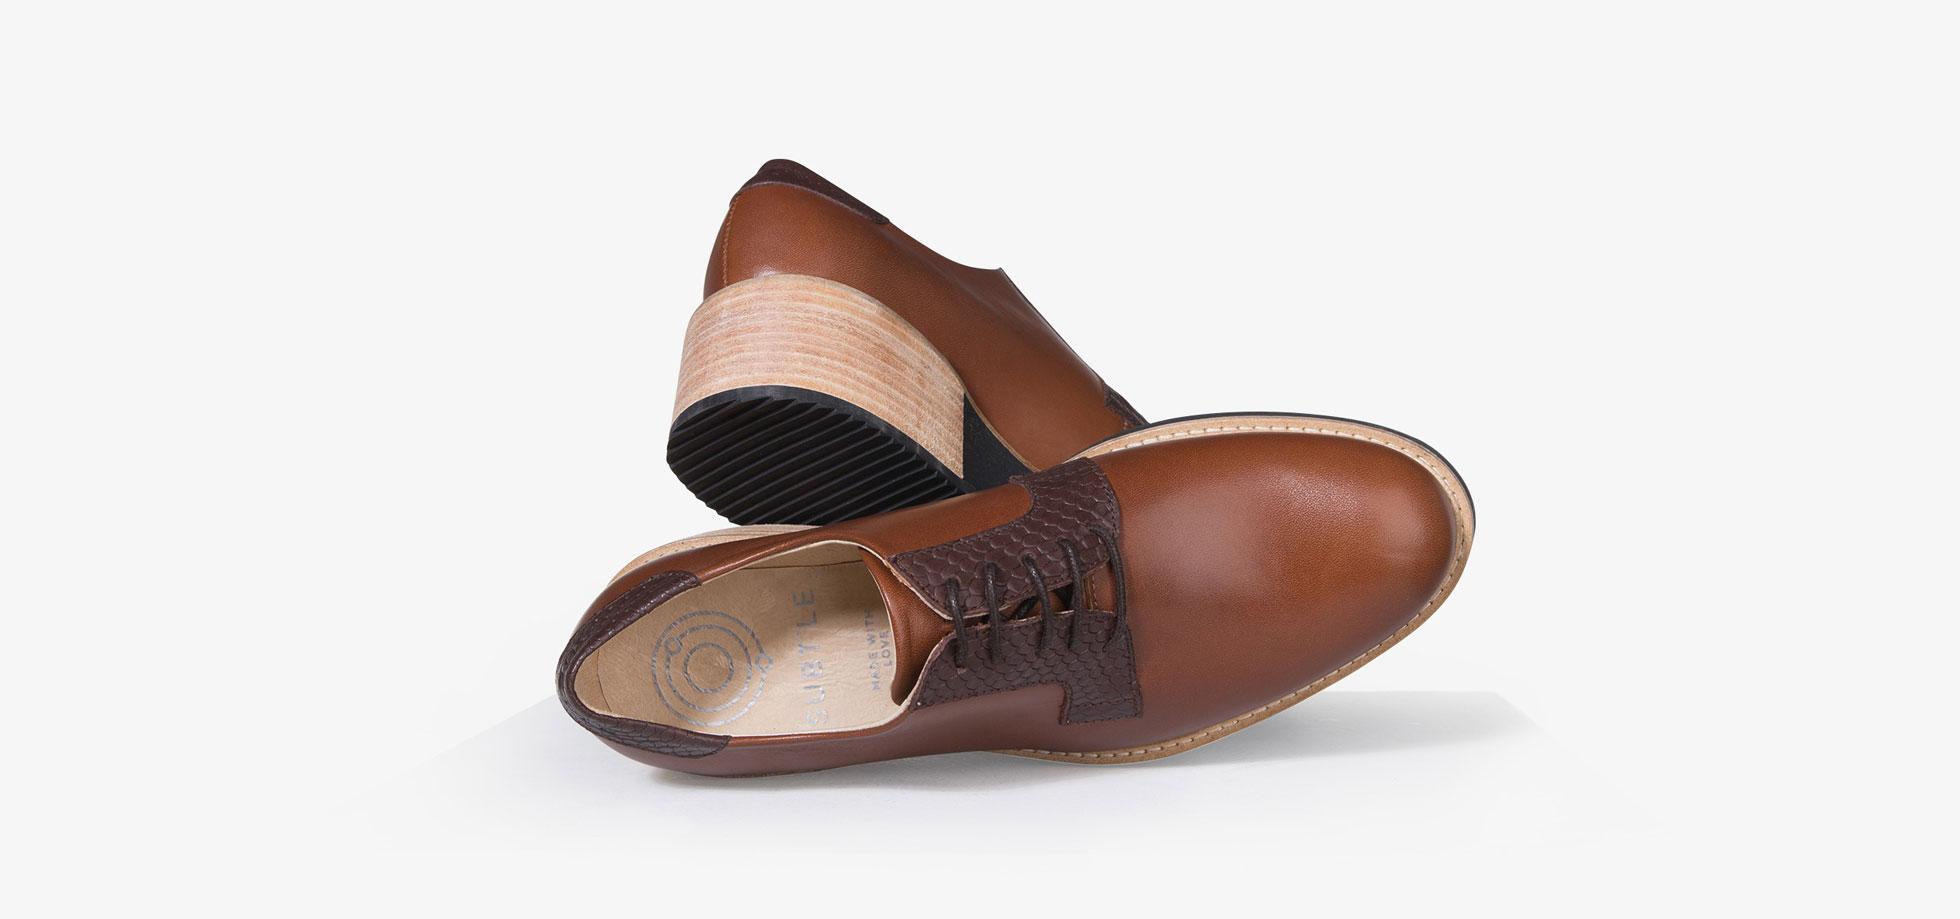 chaussure-derby-femme-camel